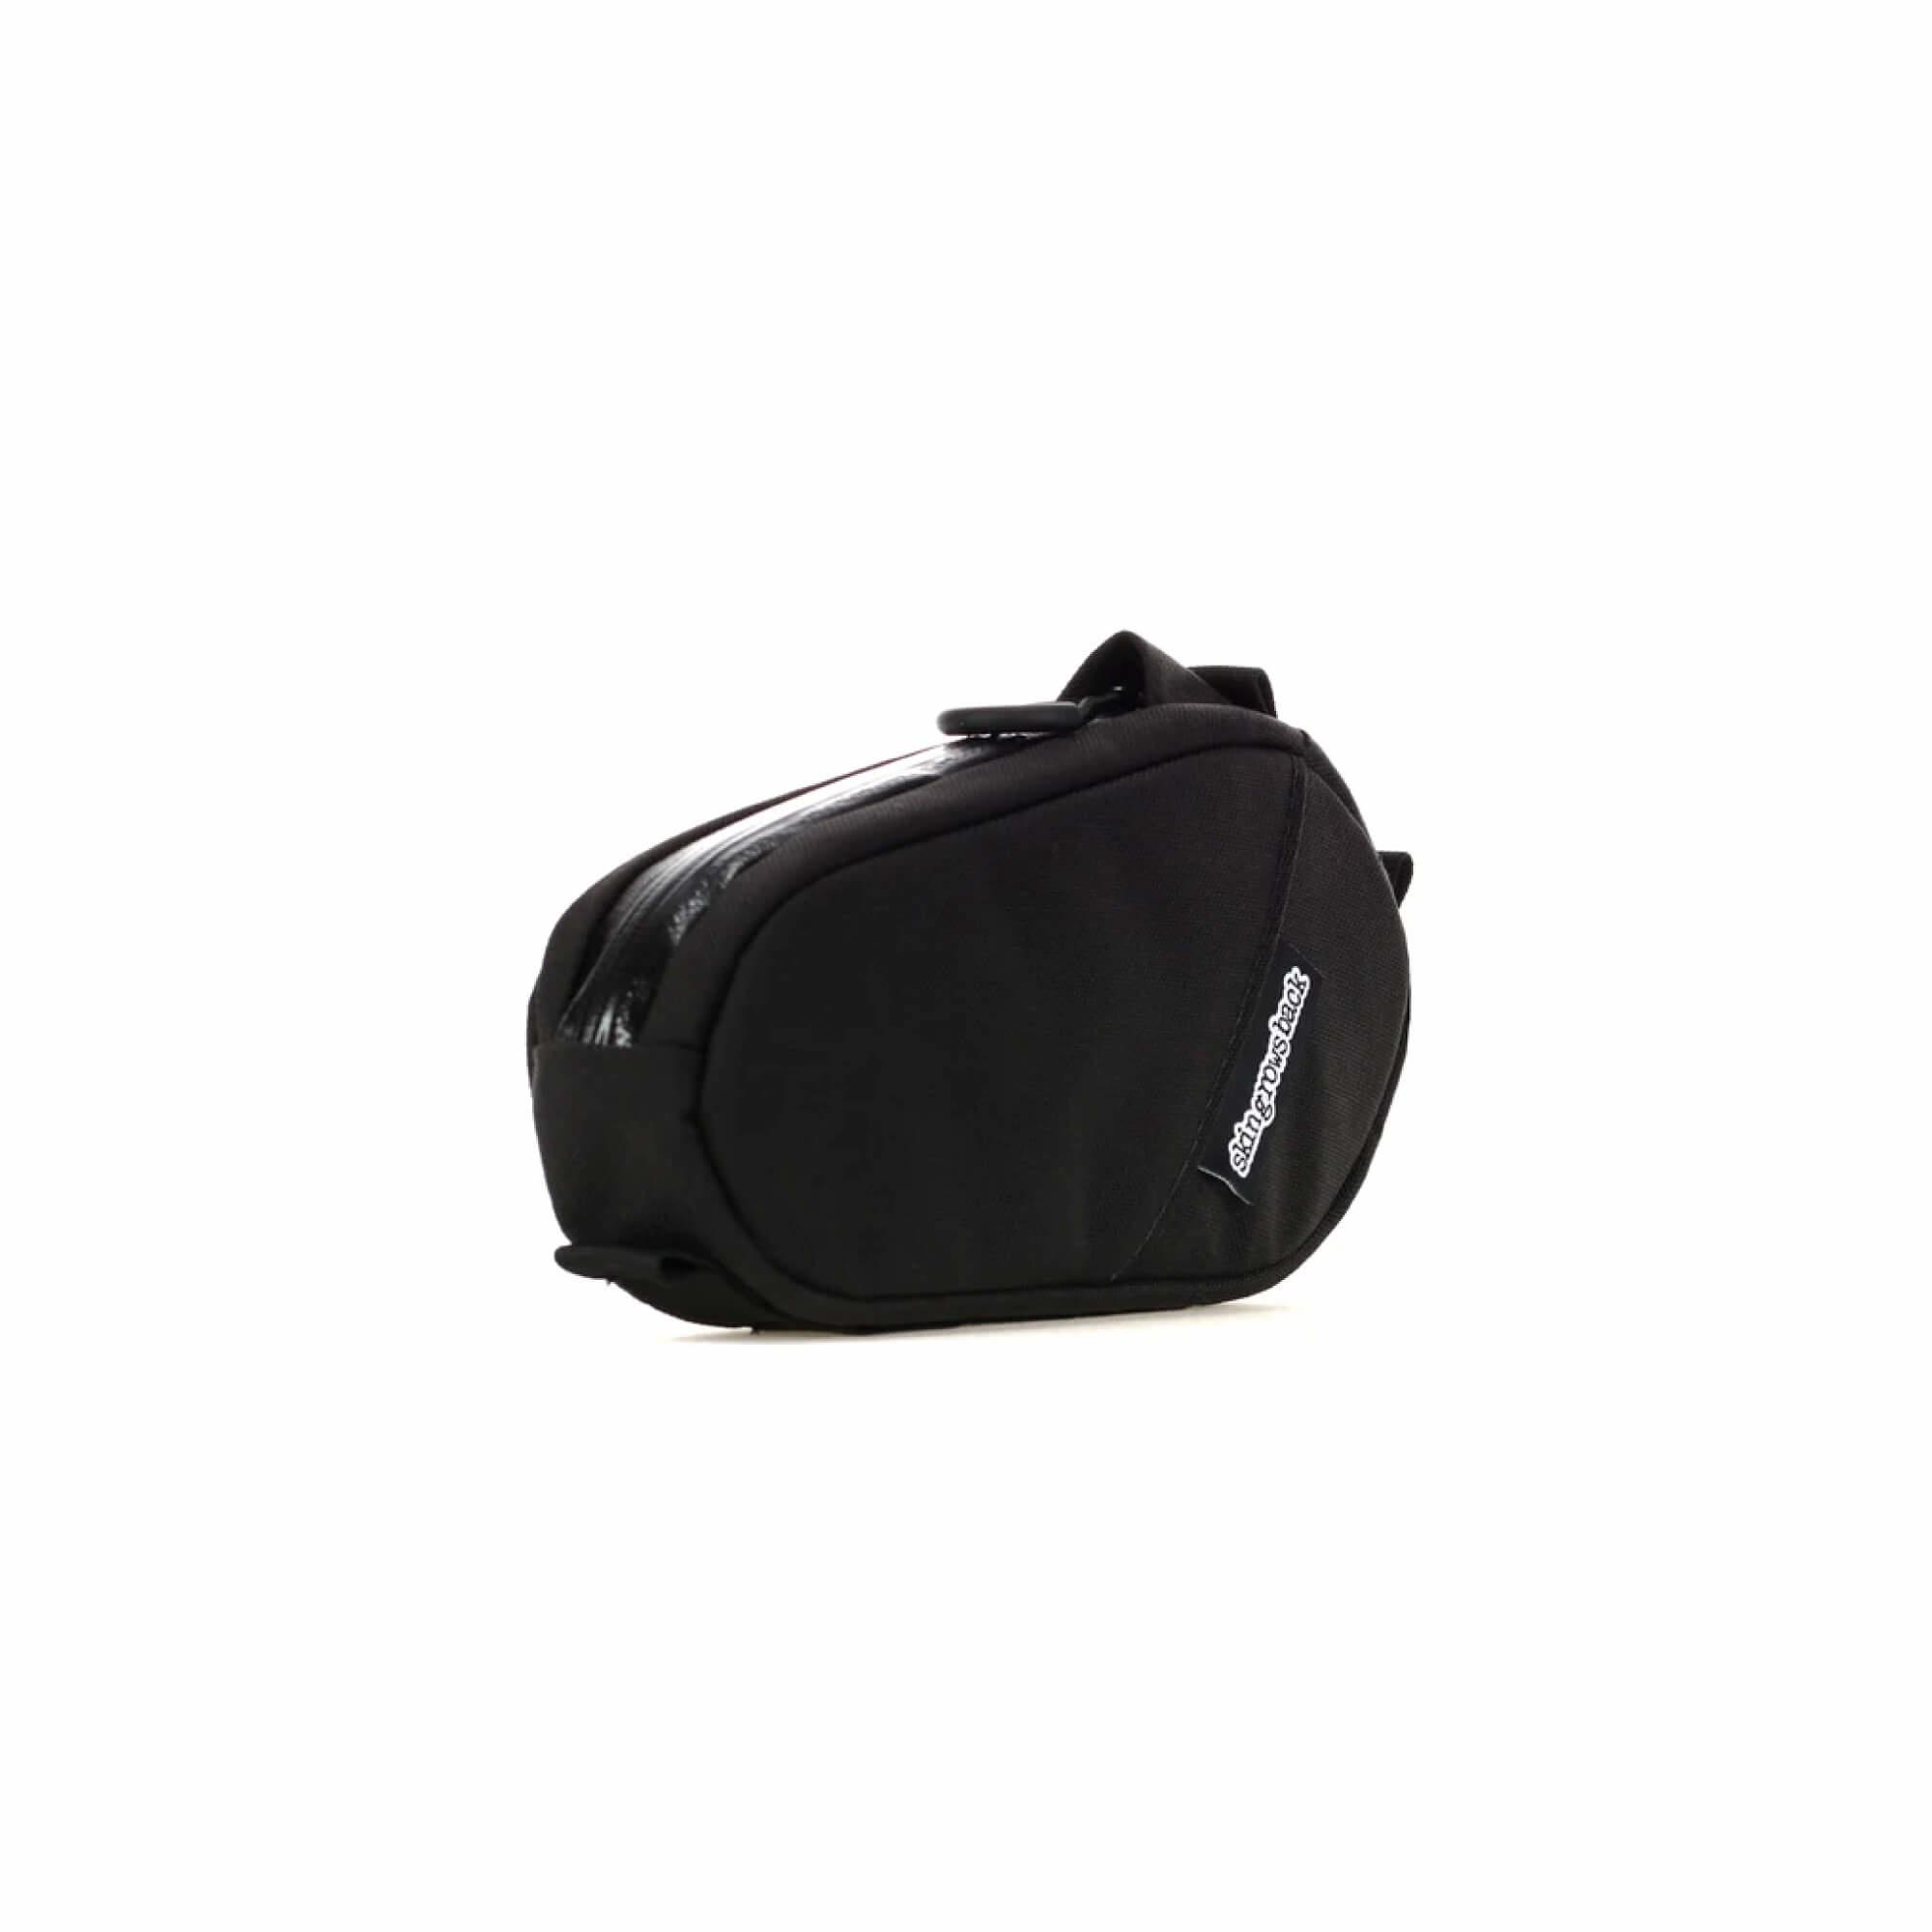 Amigo Top Tube Bag Black-2